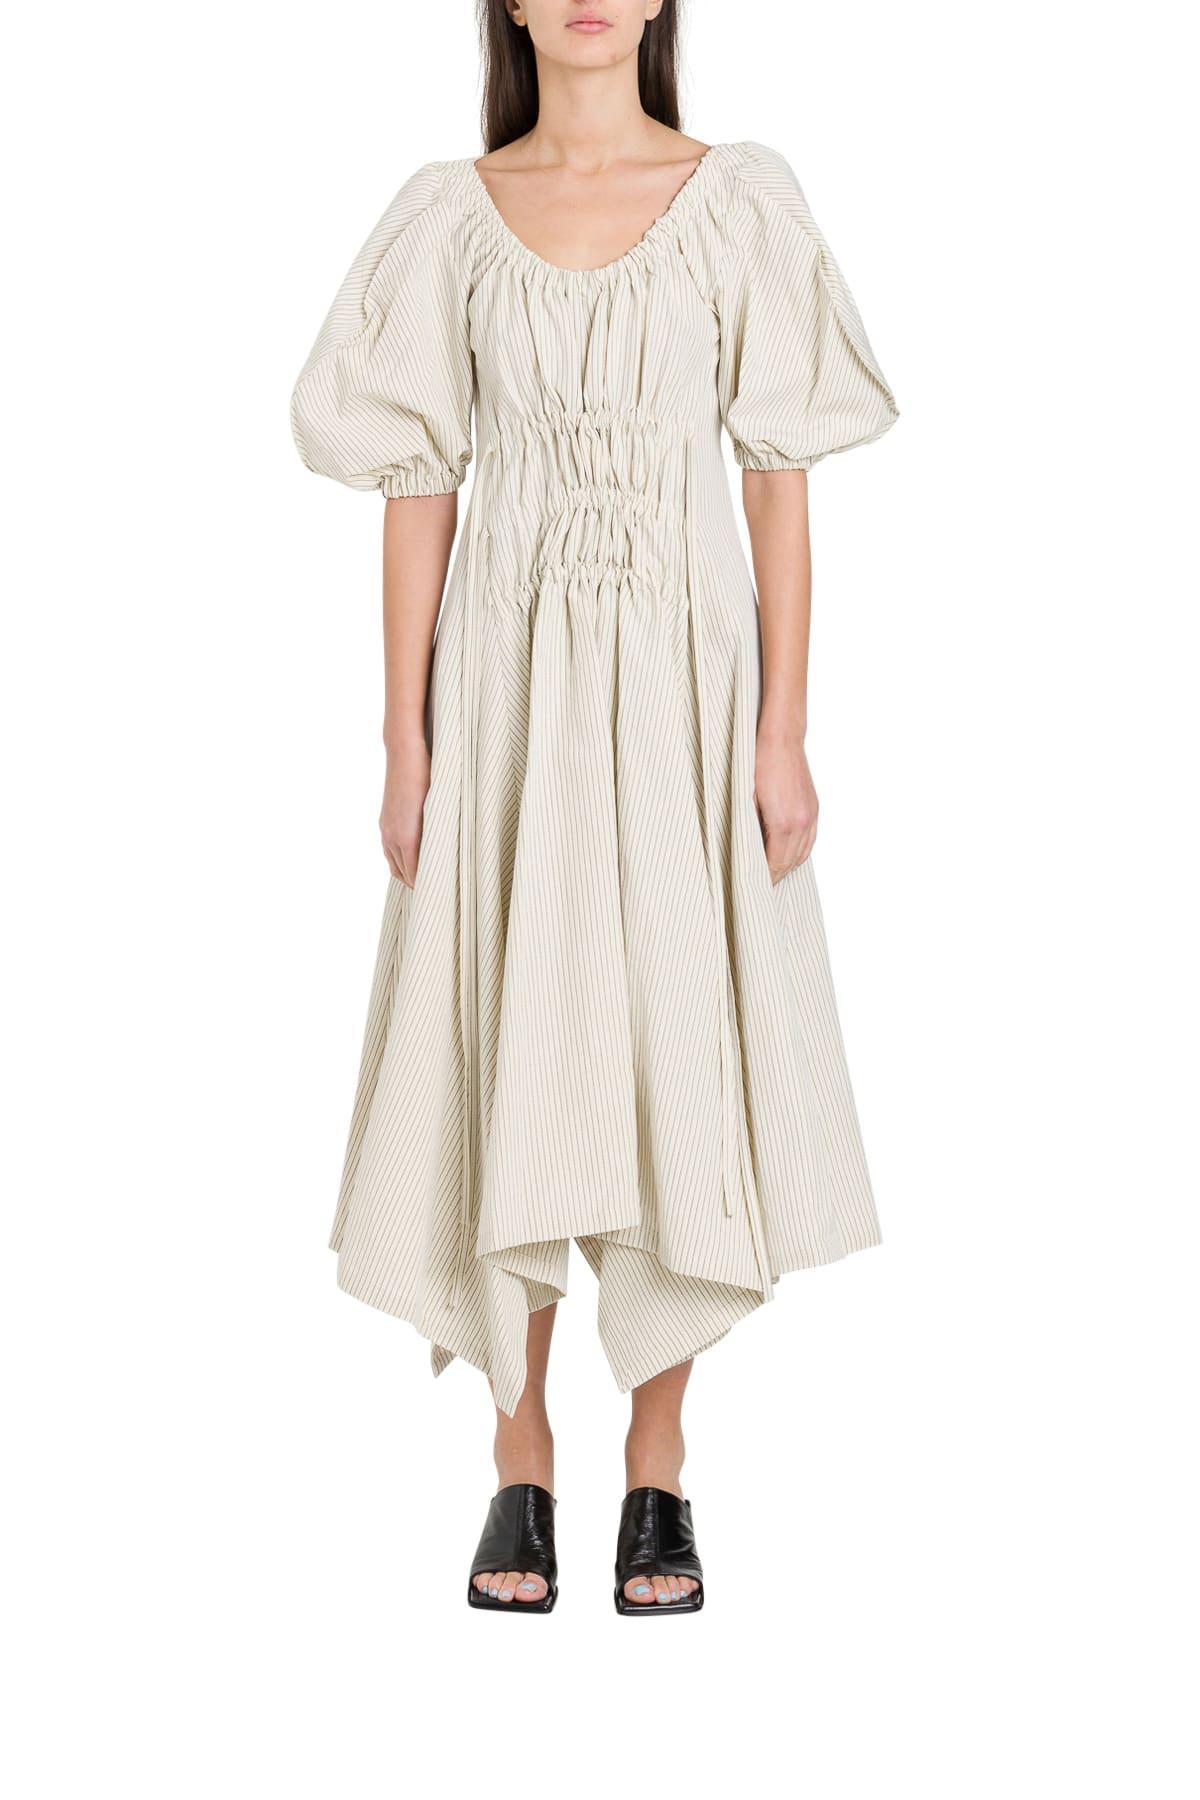 Buy Eudon Choi Pina Striped Dress online, shop Eudon Choi with free shipping